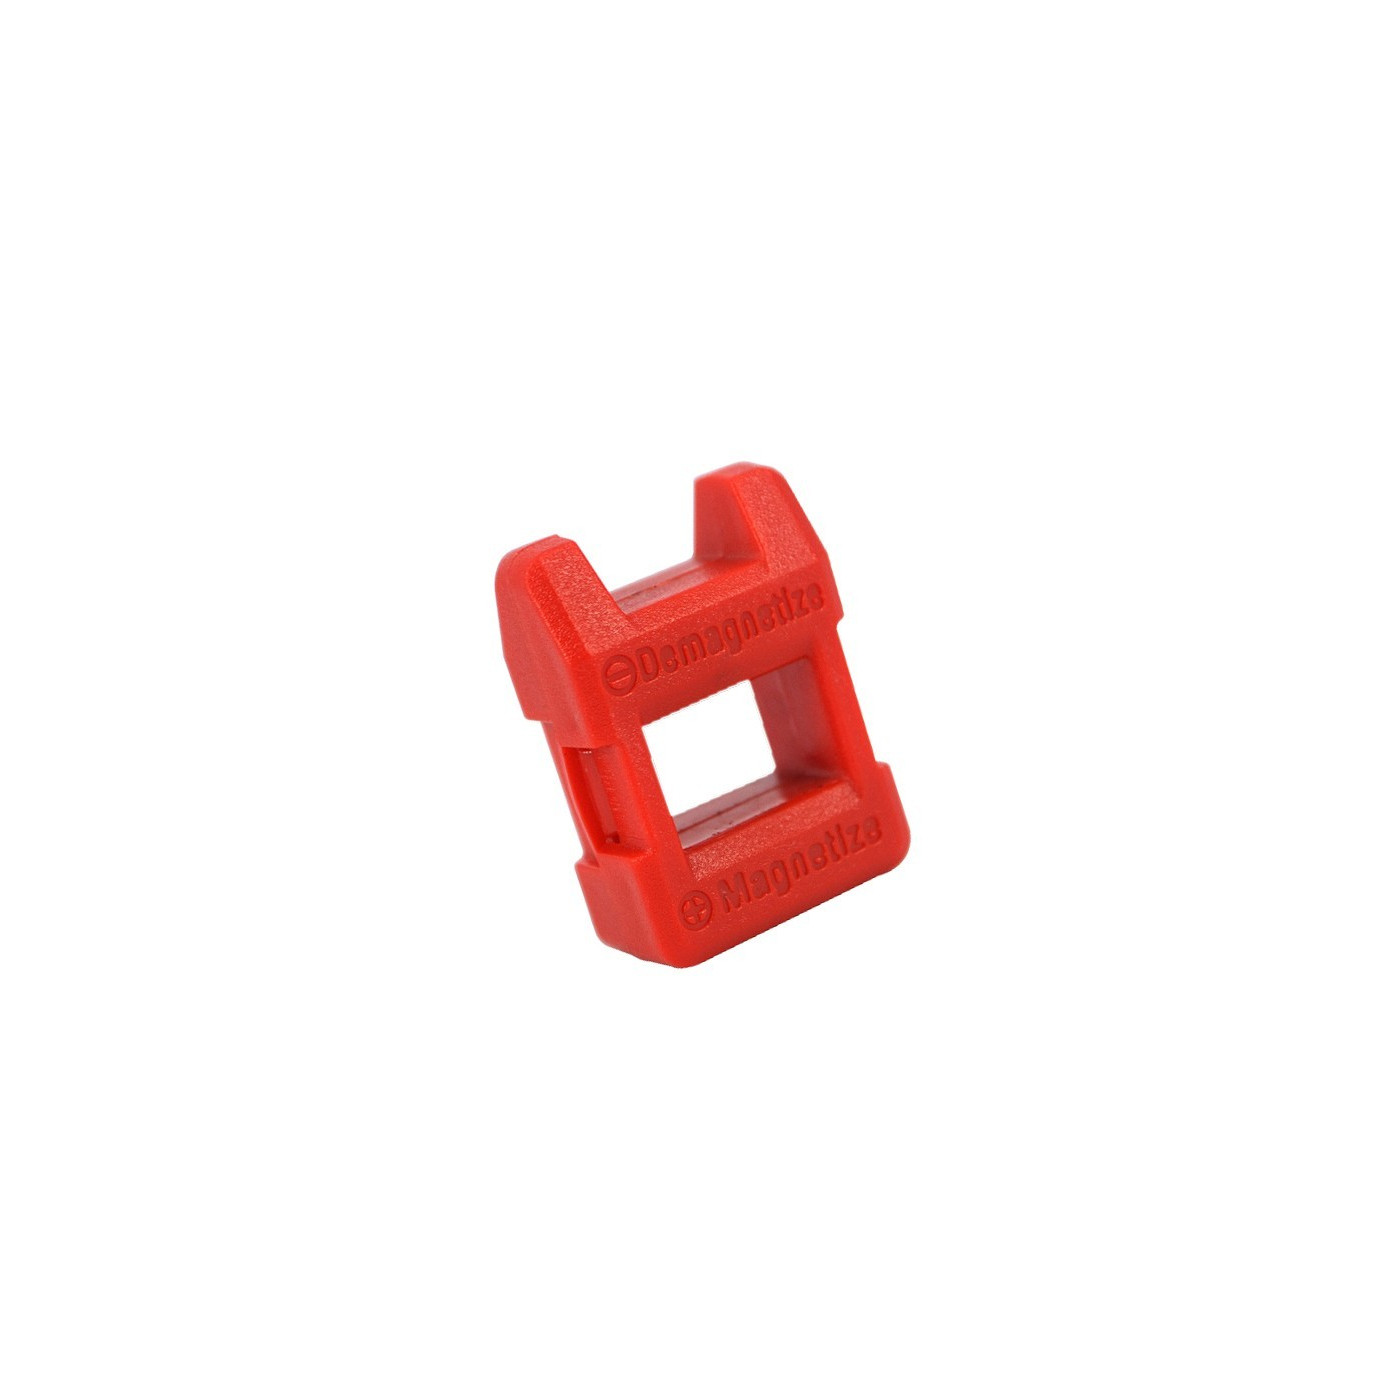 Magnetiseerder / Demagnetiseerder klein  - 1